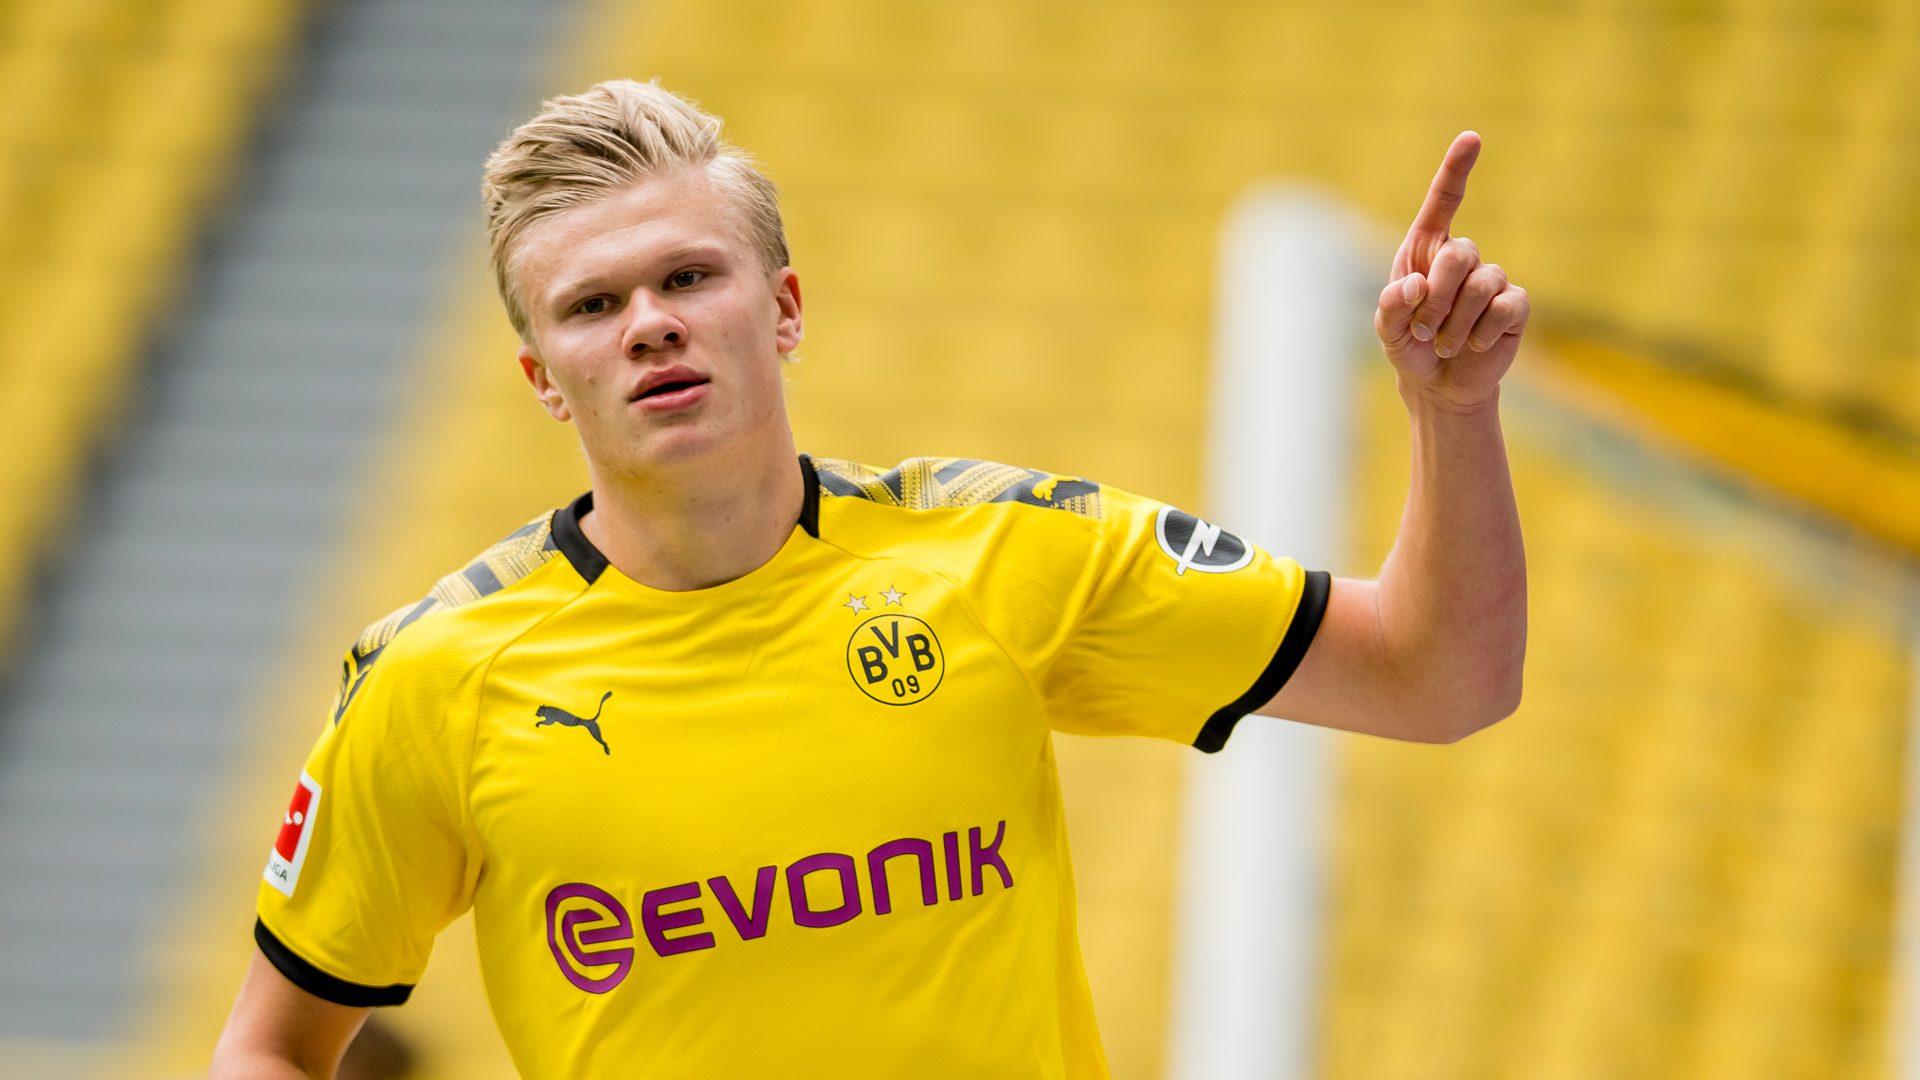 Bundesliga Borussia Dortmund S Erling Haaland I M Not Surprised I Scored Against Schalke